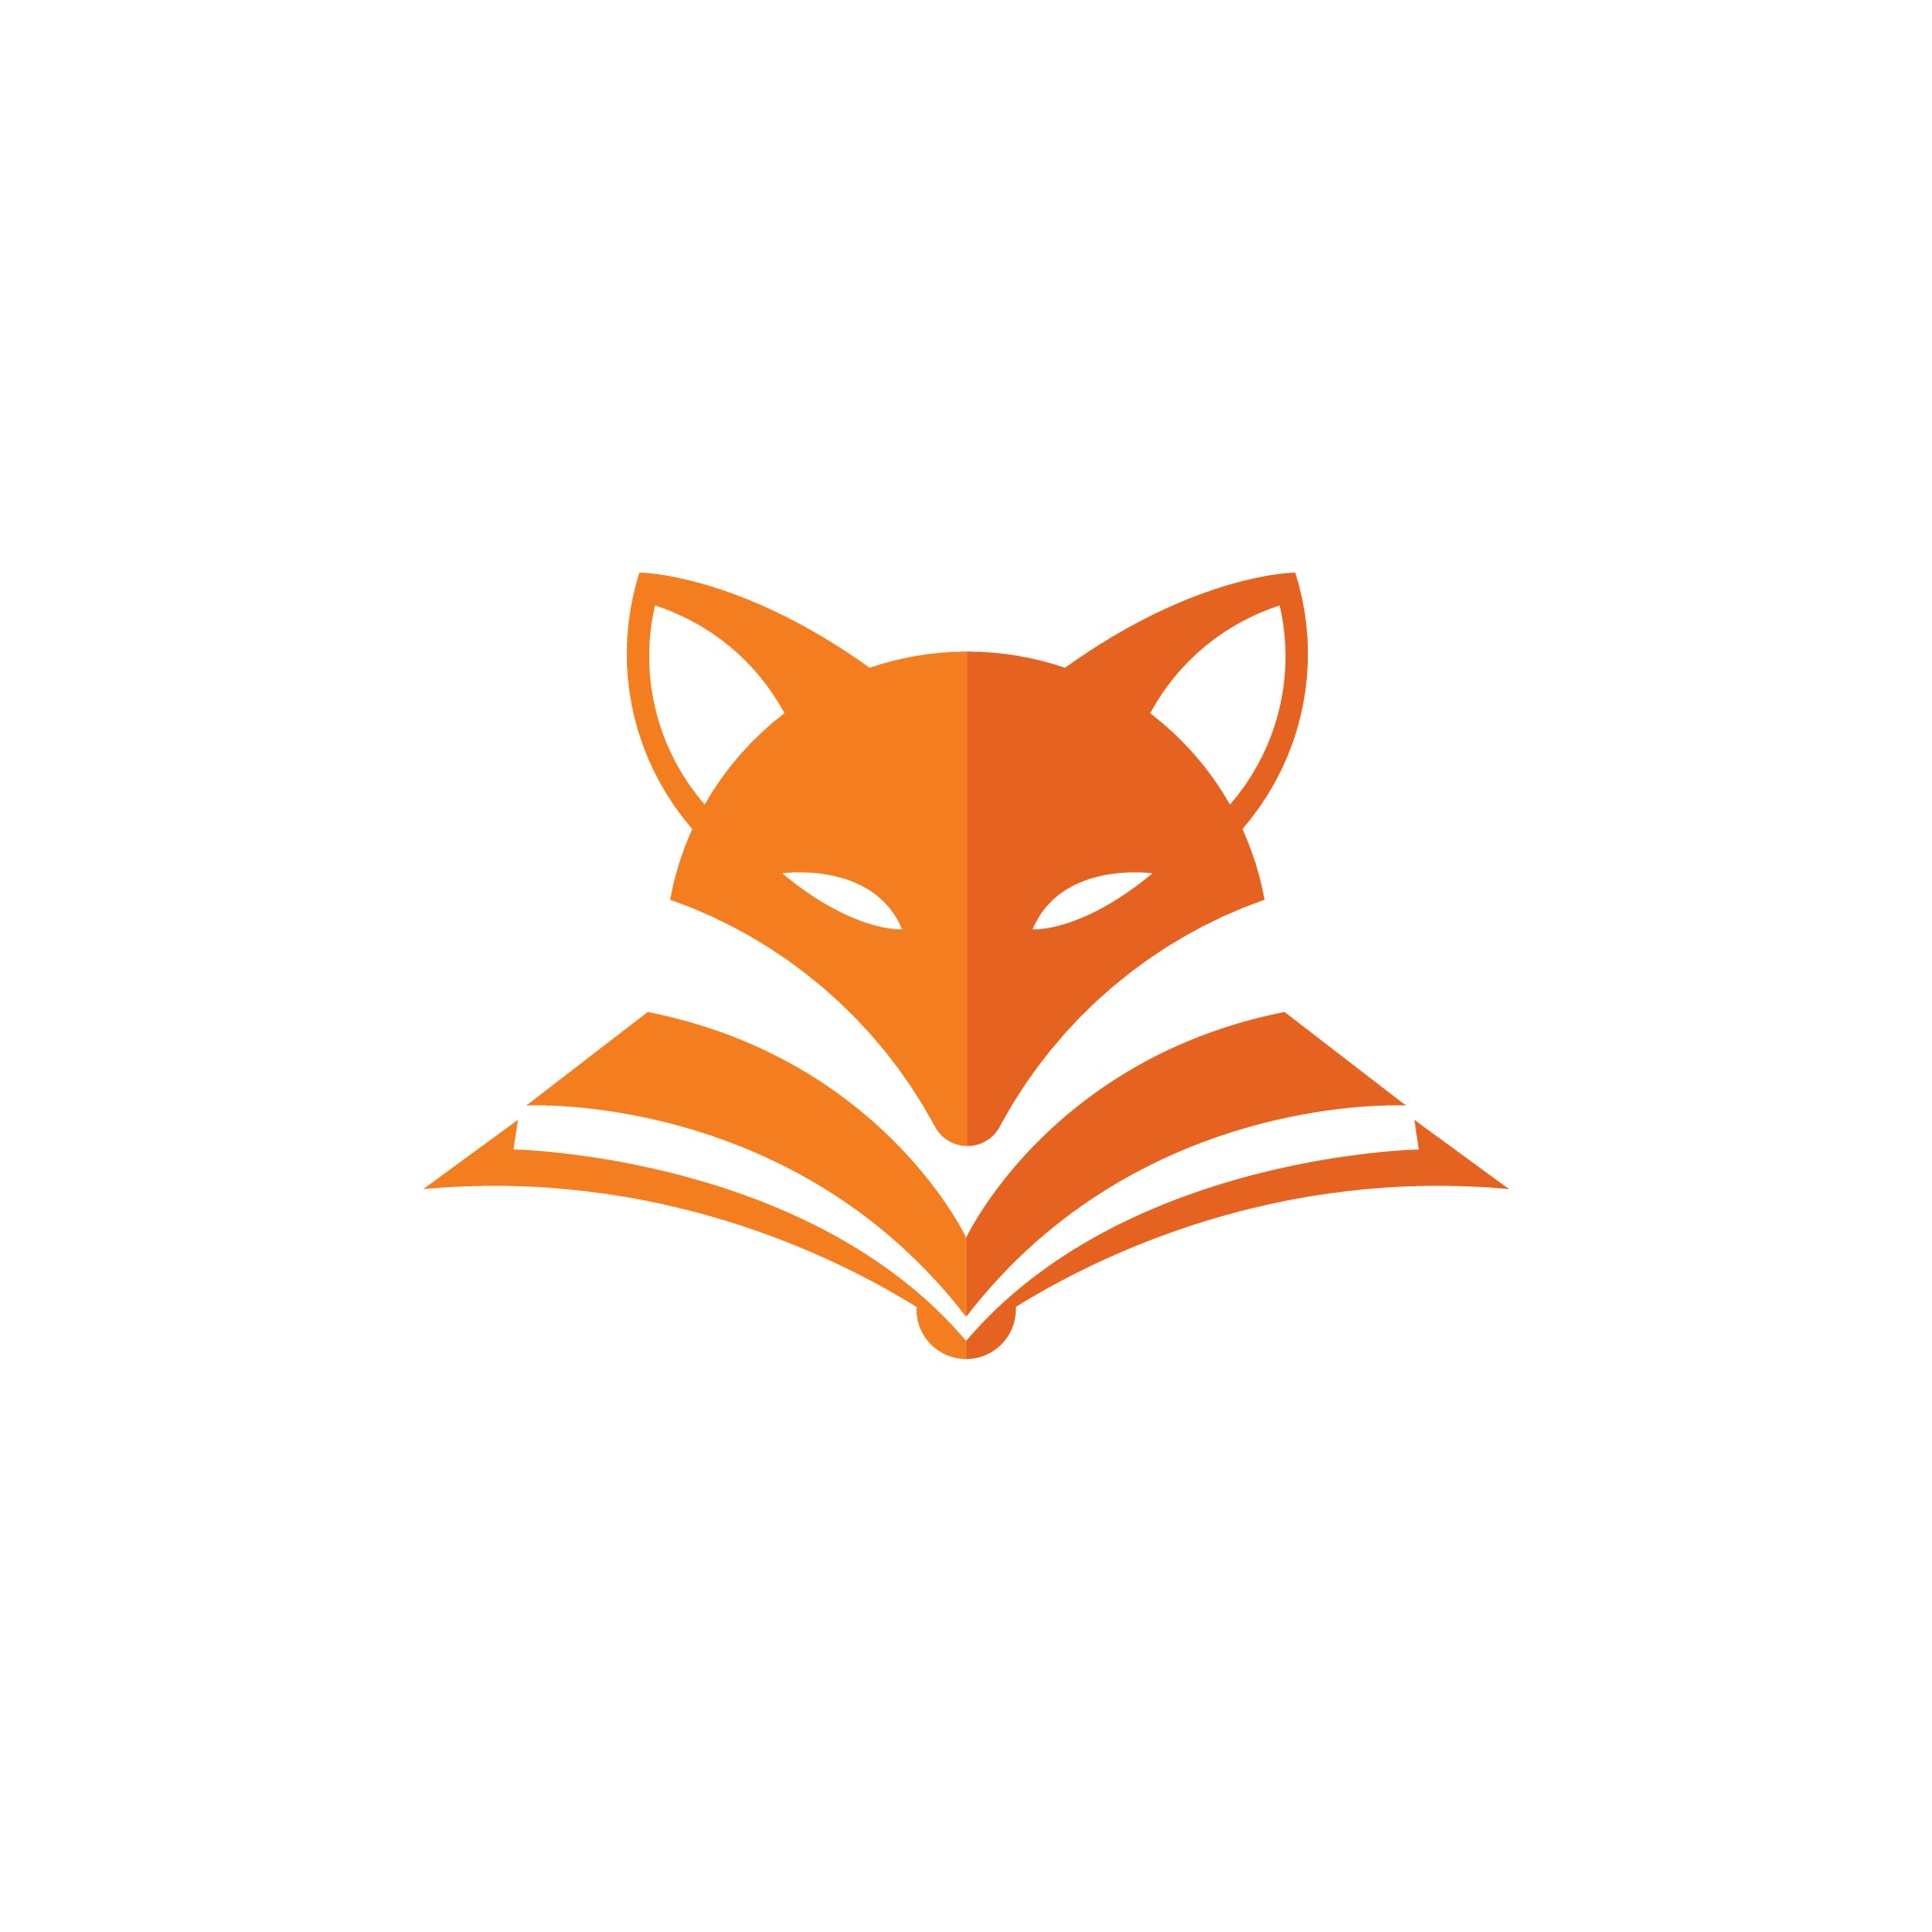 Create a modern Fox/Foxhead logo to build an education network